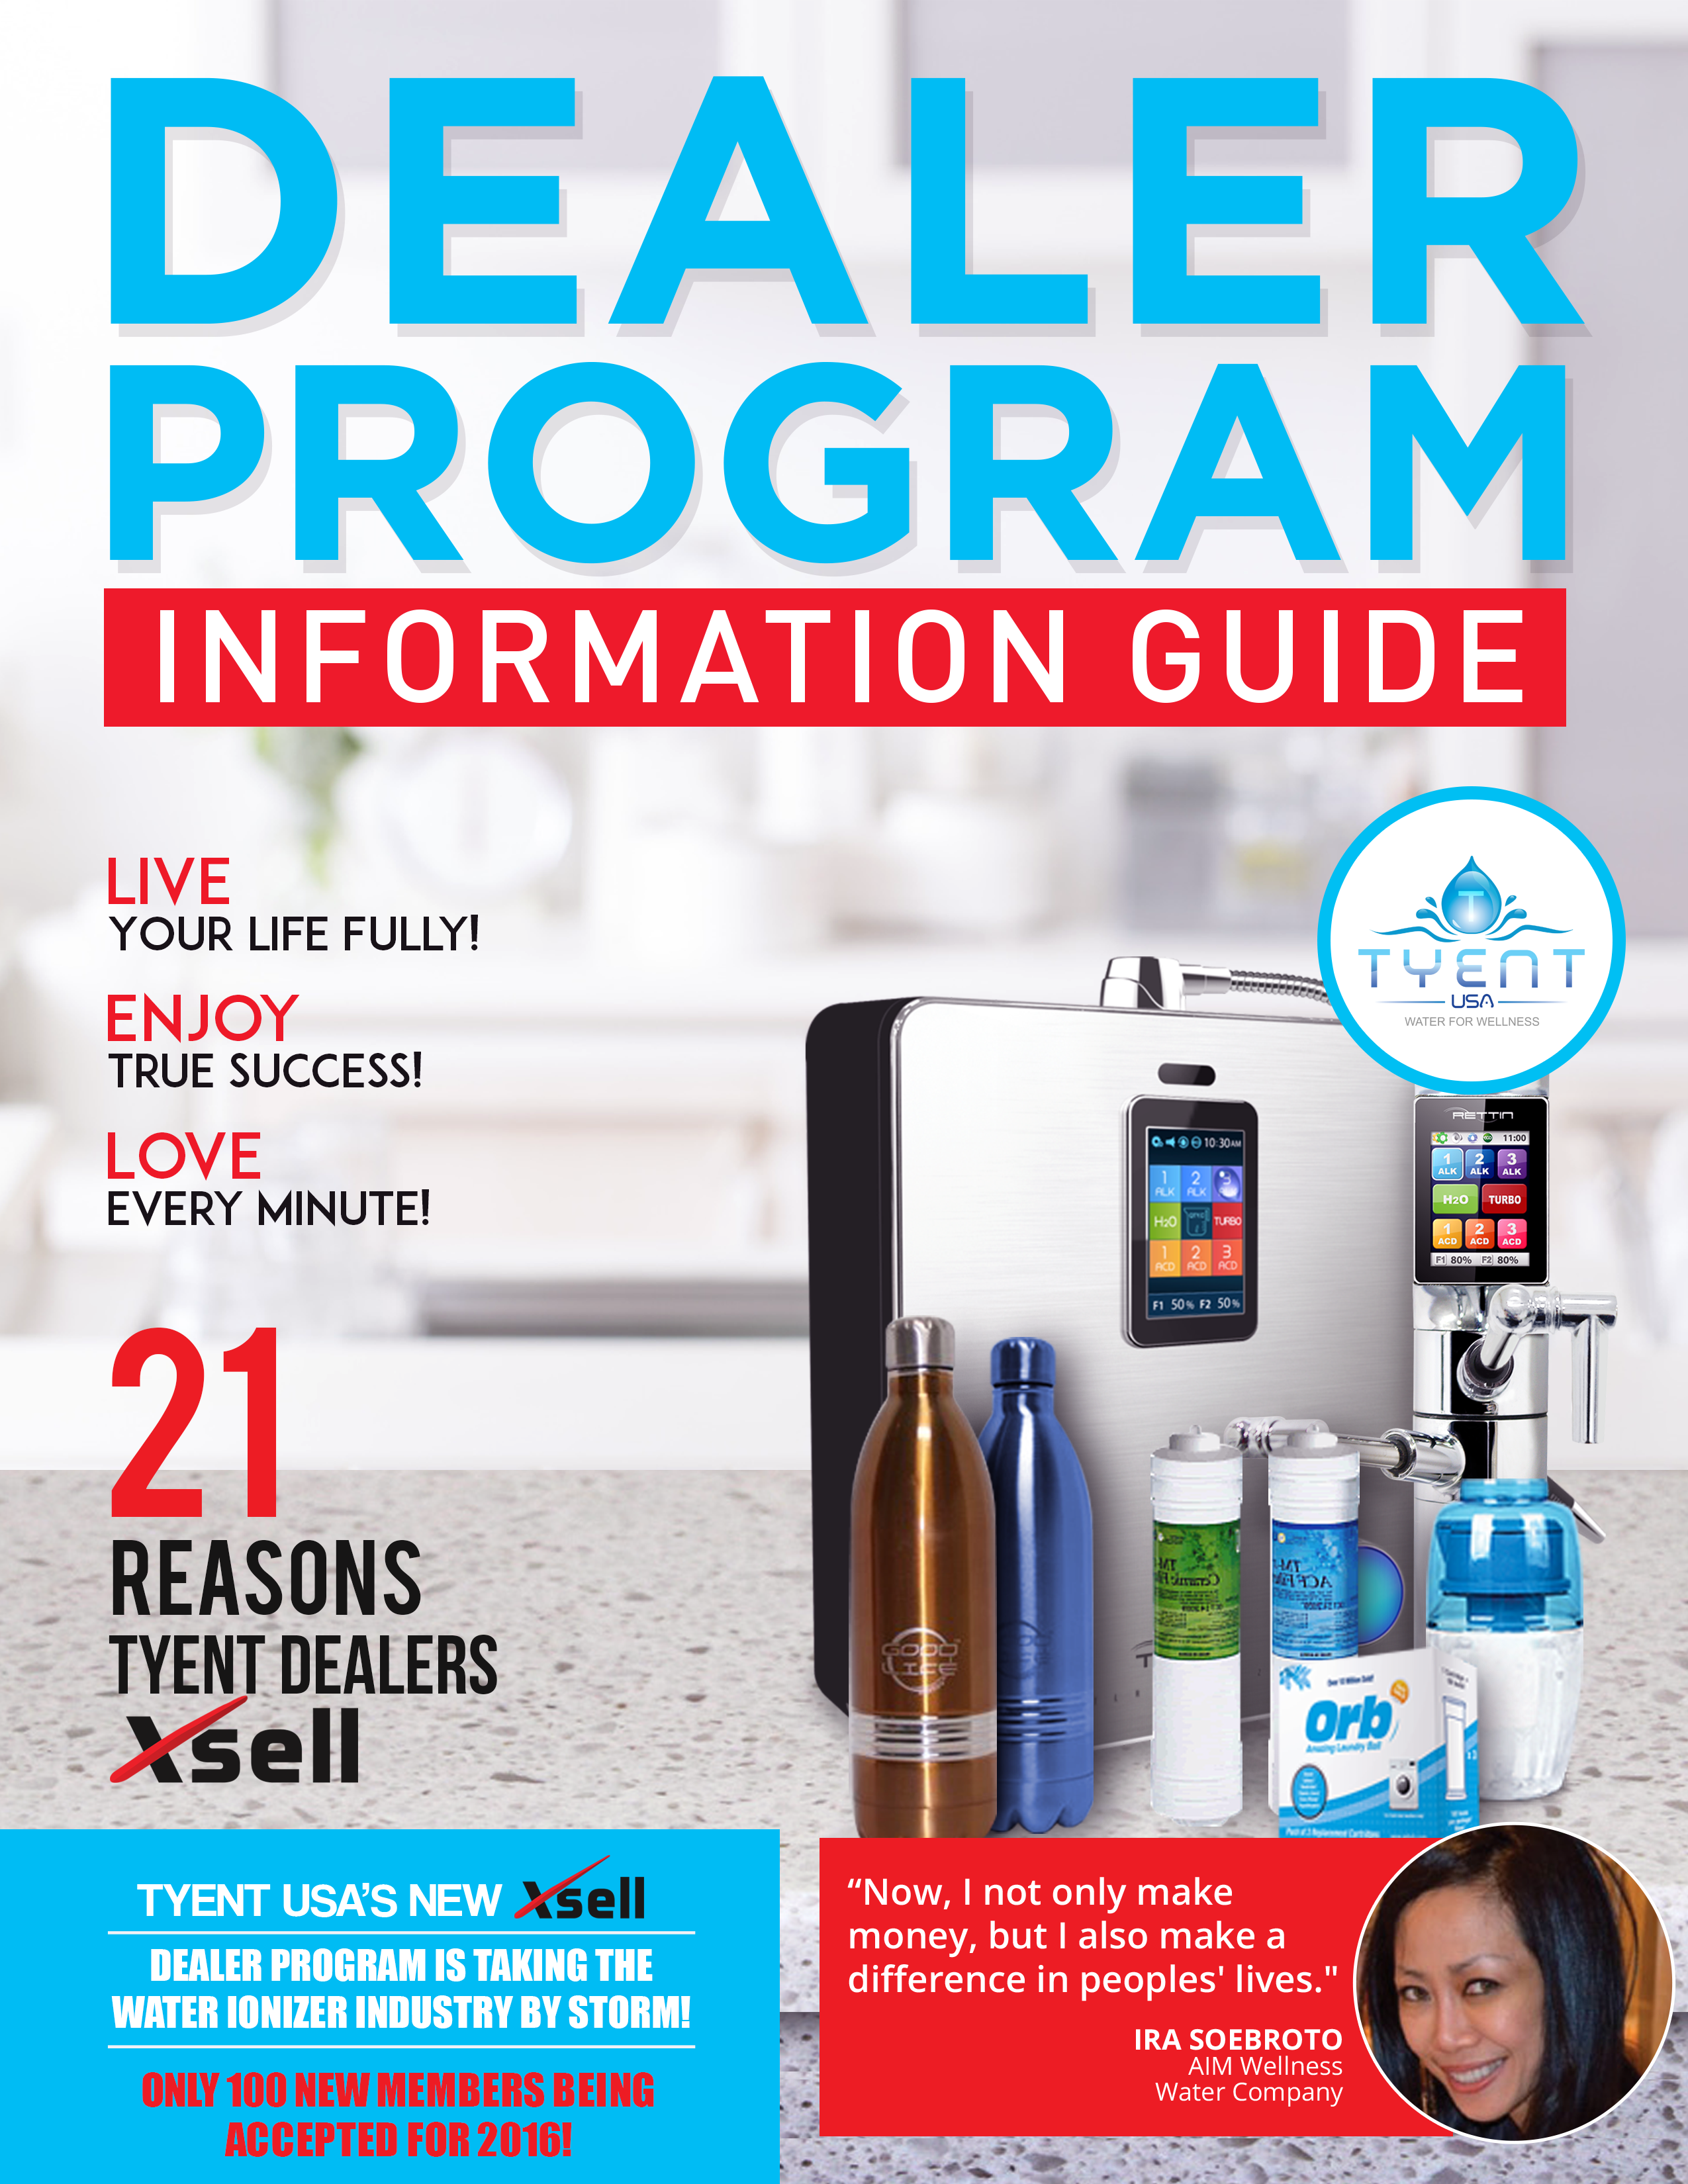 TyentUSA Dealer Program guide